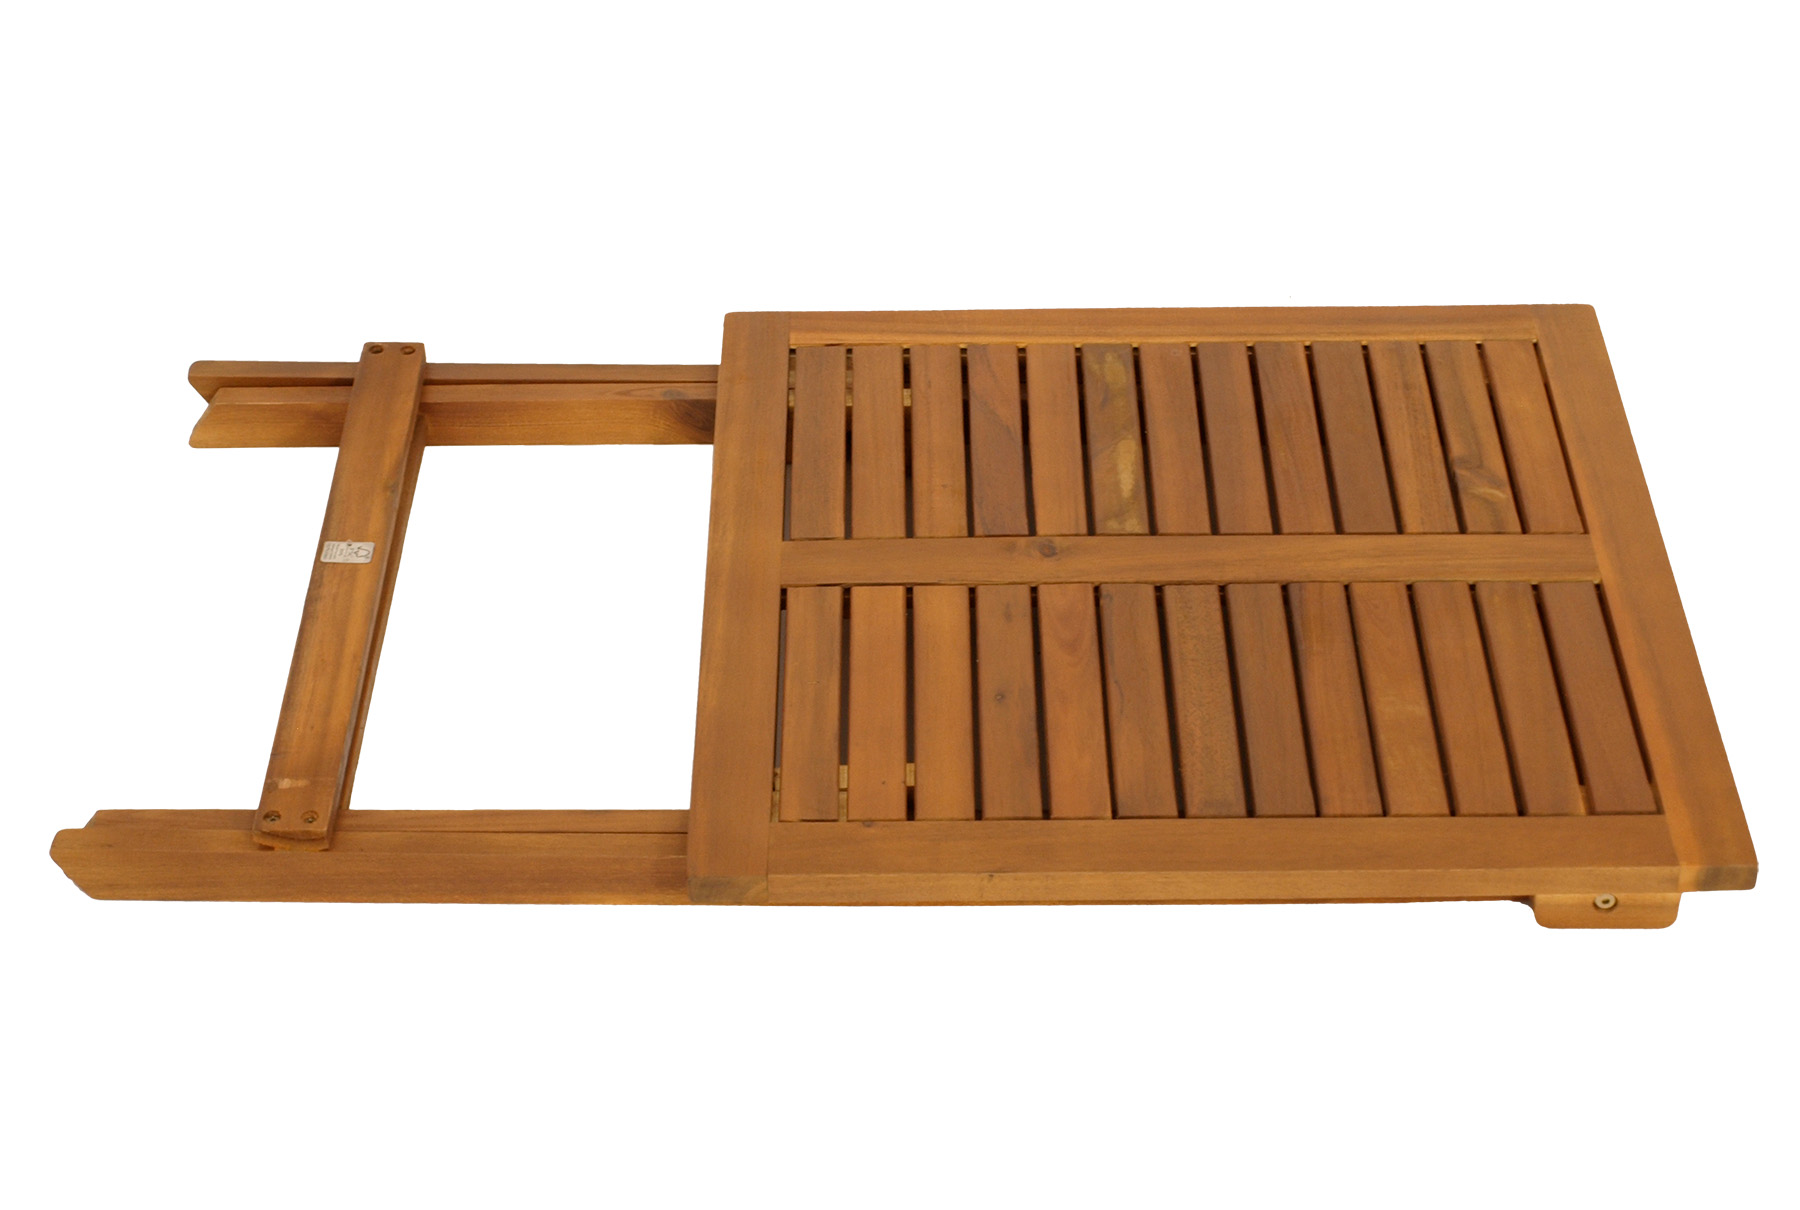 Klapptisch LIMA 60x60cm, Akazie geölt, FSC®-zertifiziert